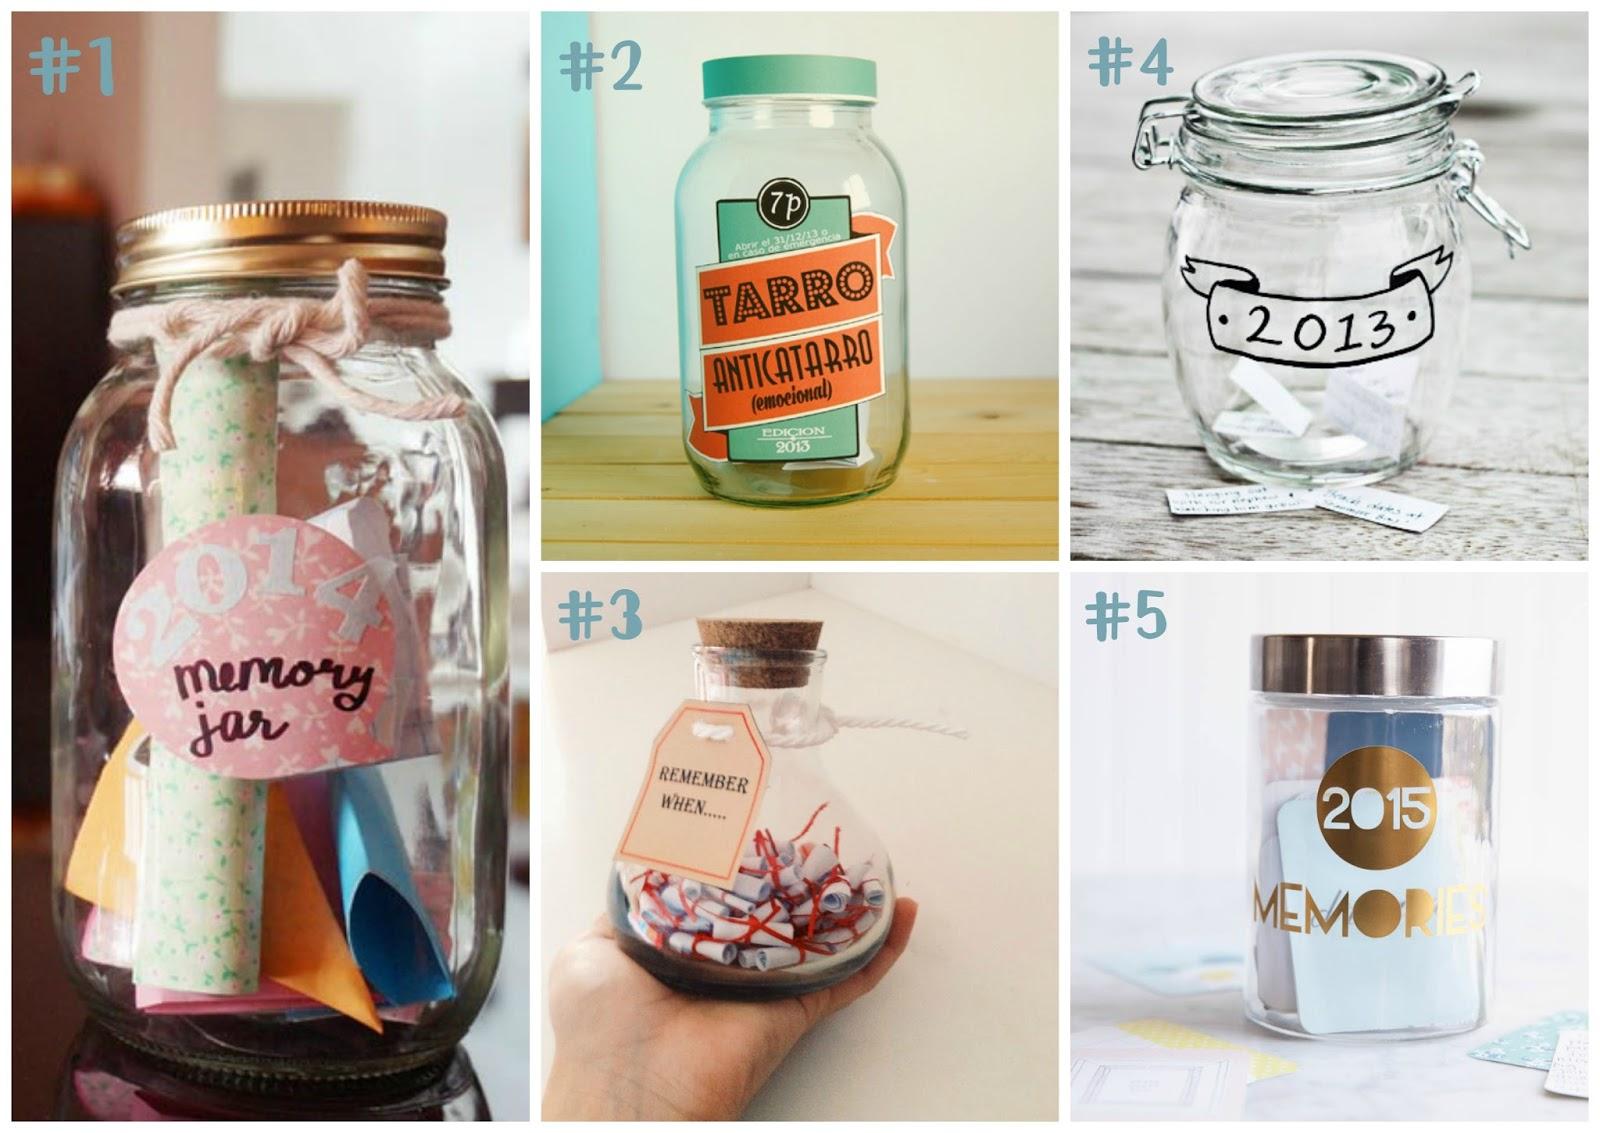 tarros-para-guardar-recuerdos-mermory-jar